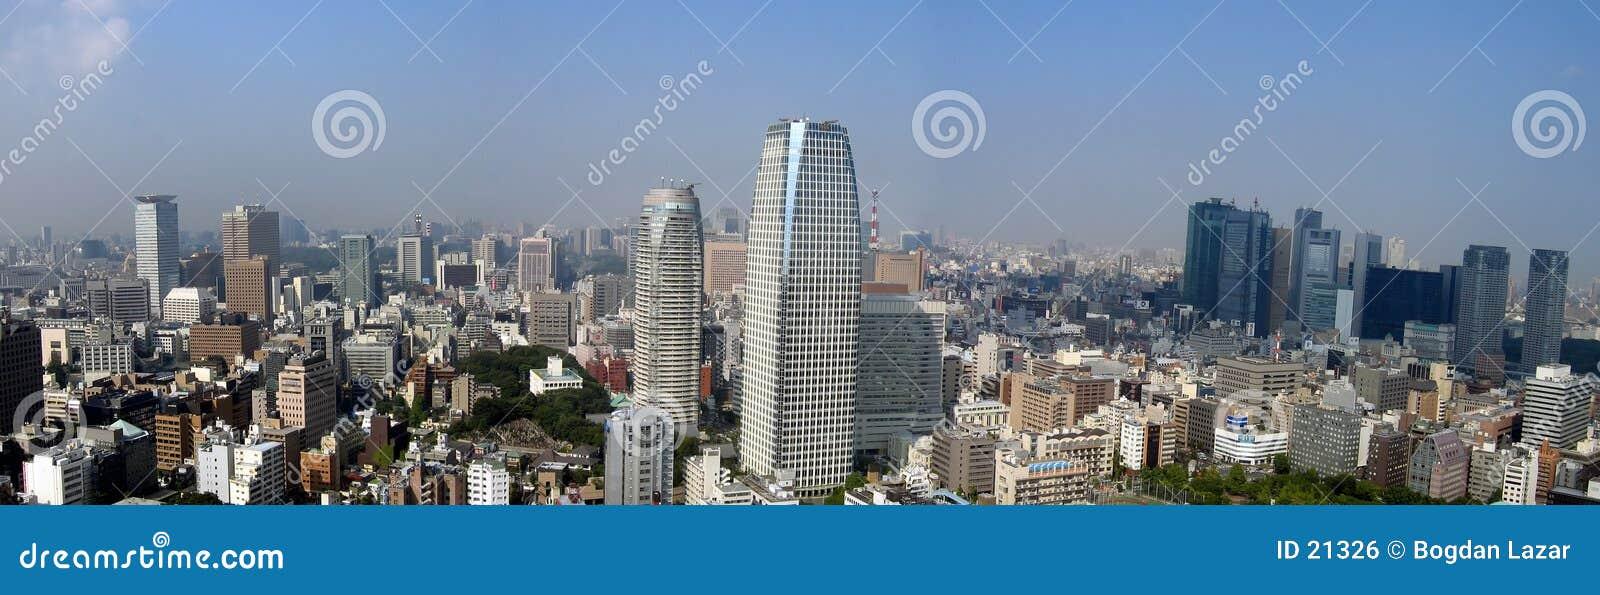 Opinión panorámica de Tokio